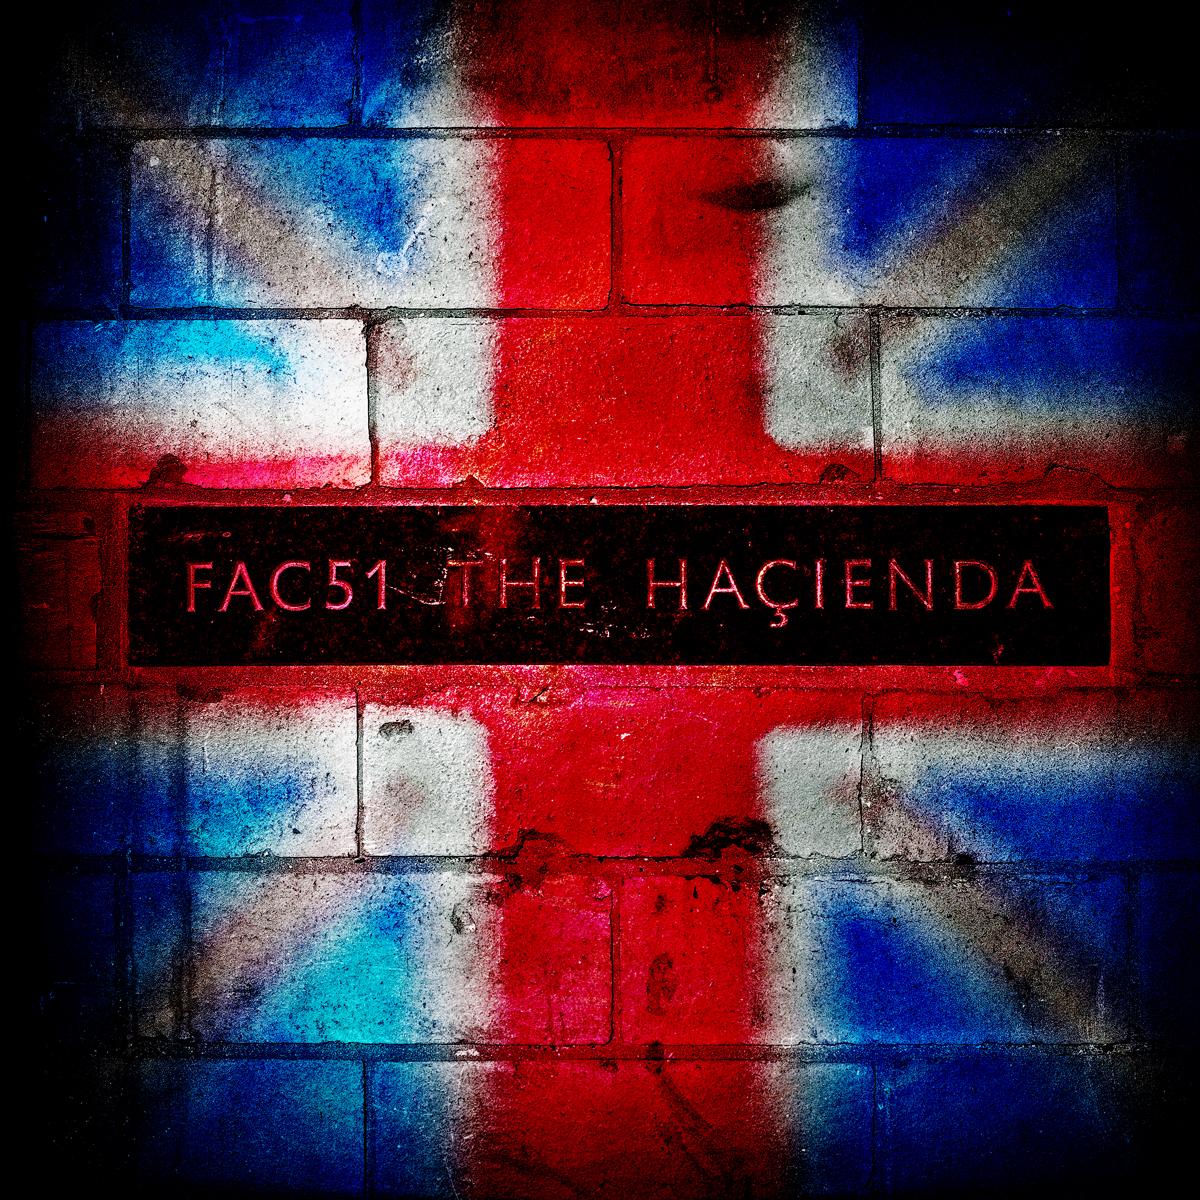 "Hacienda Club Original FAC51 ""Made in Manchester"" 20""x20"" £195.00.  30""x30"" £300.00  40""x40"" £495.00"